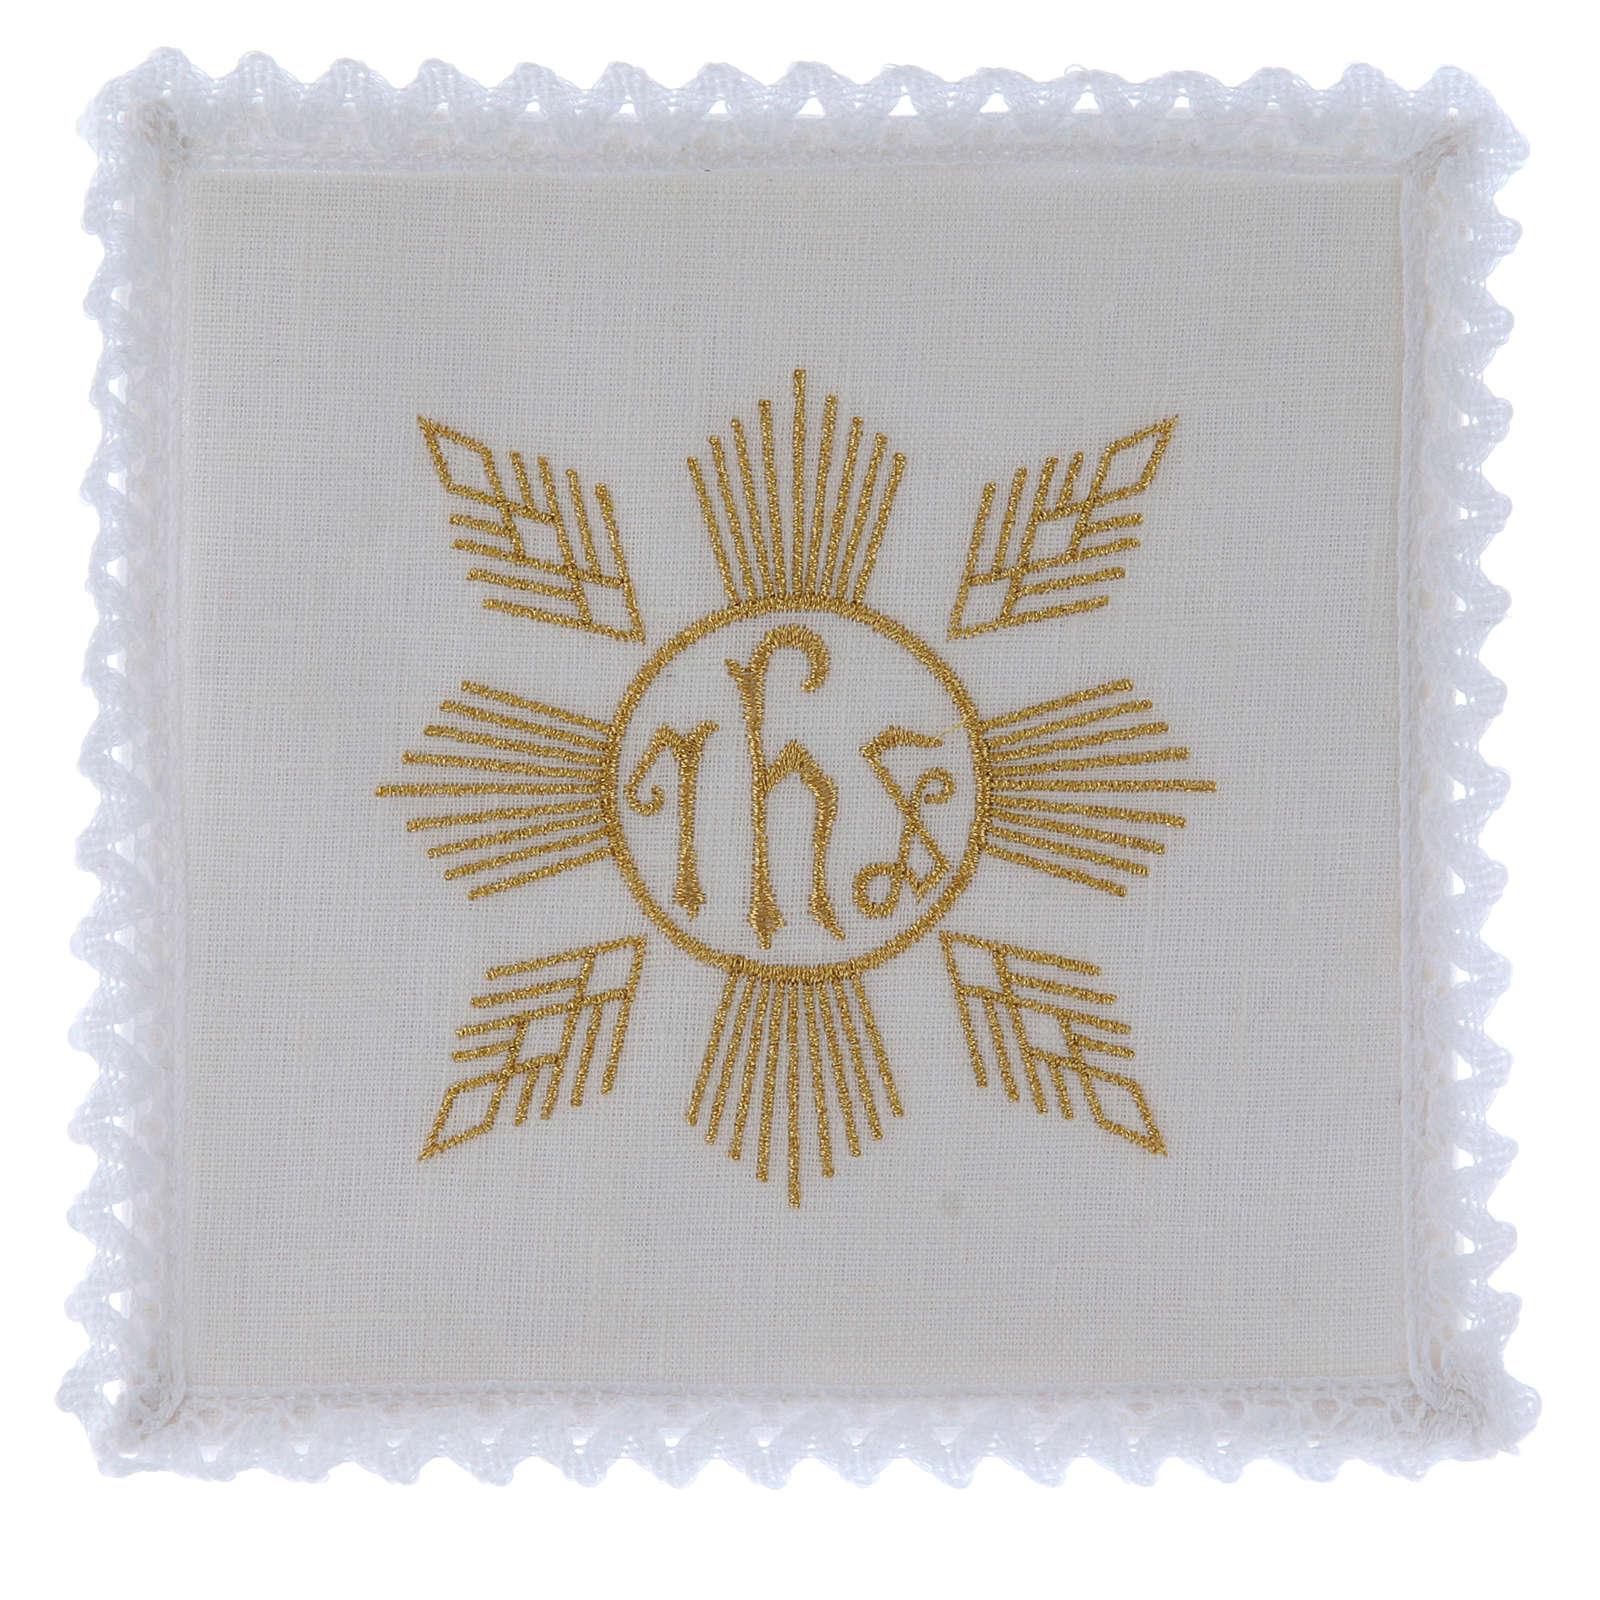 Altar linen golden embroideries, geometrical figures & JHS symbol 4